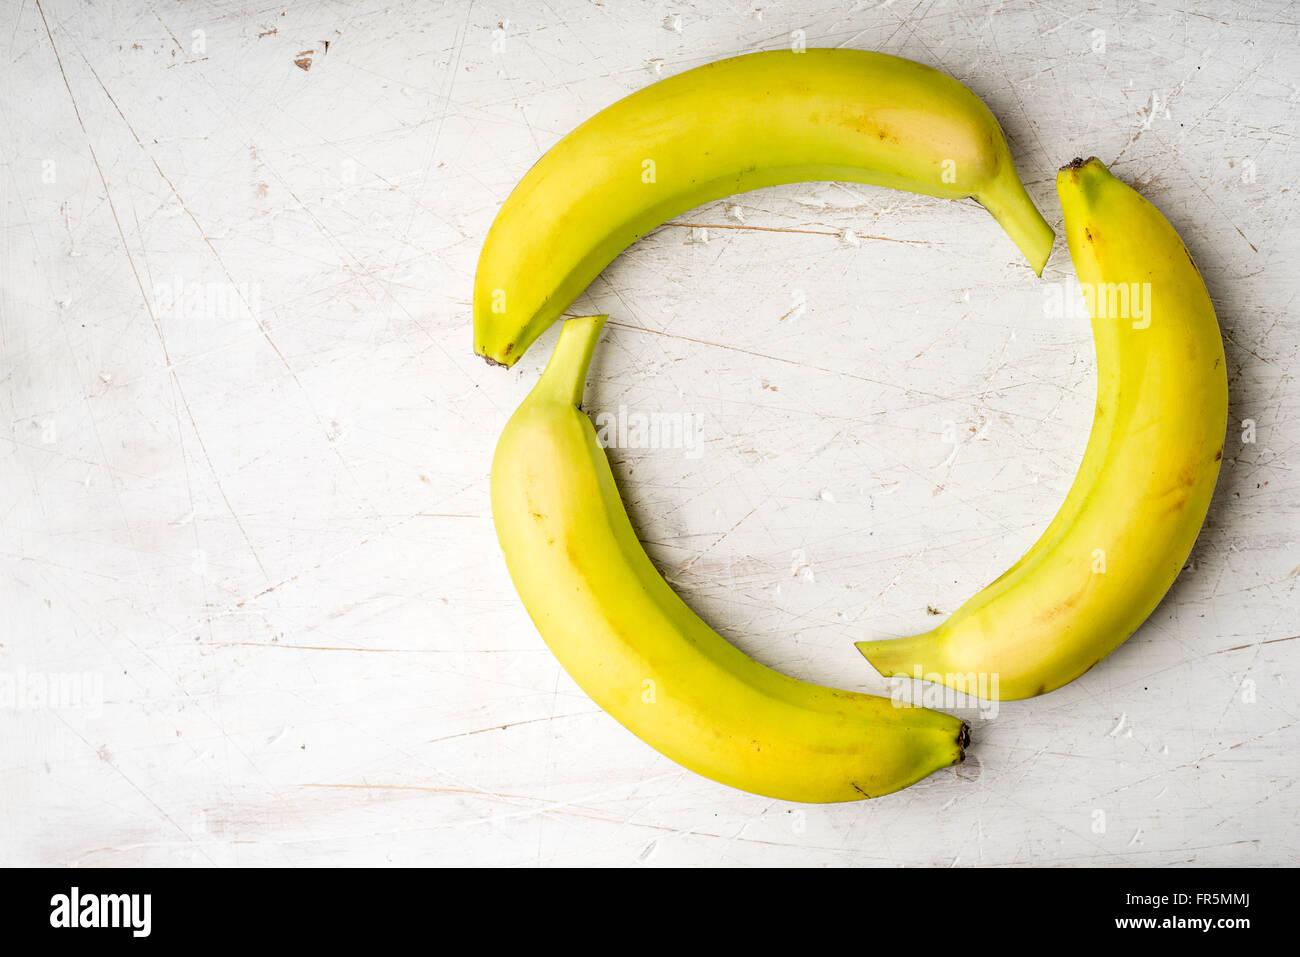 Yellow bananas on a white table horizontal - Stock Image